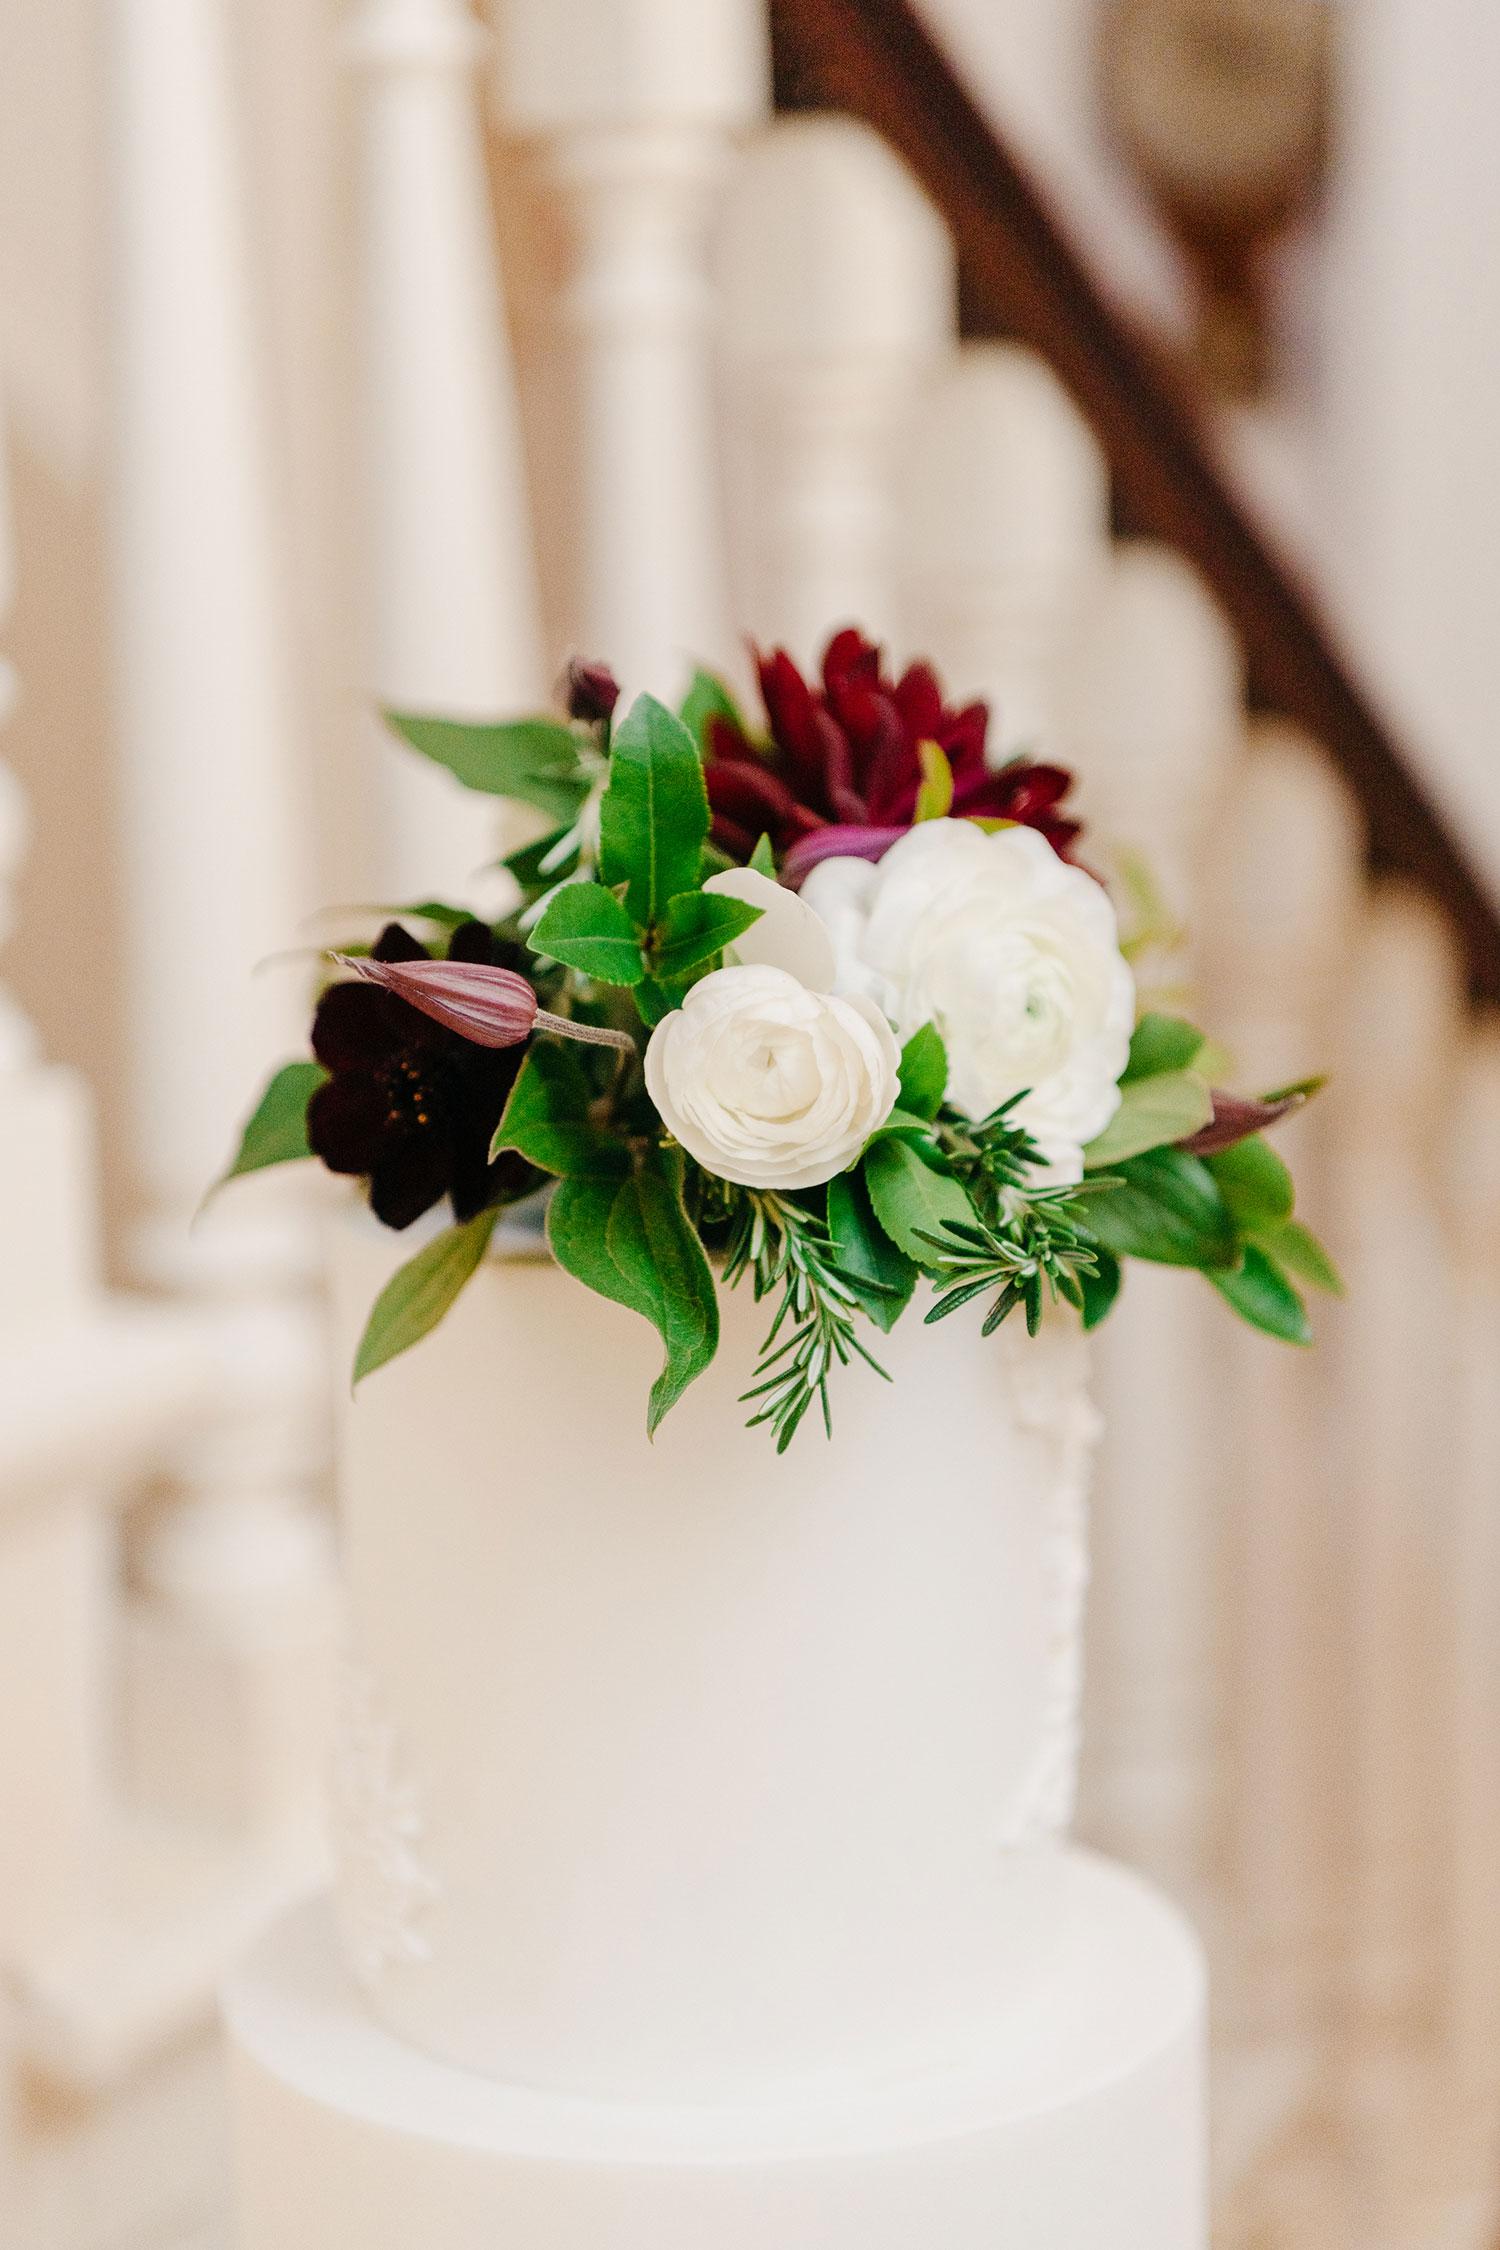 bellinter-house-wedding-photographer-0101_0101.jpg